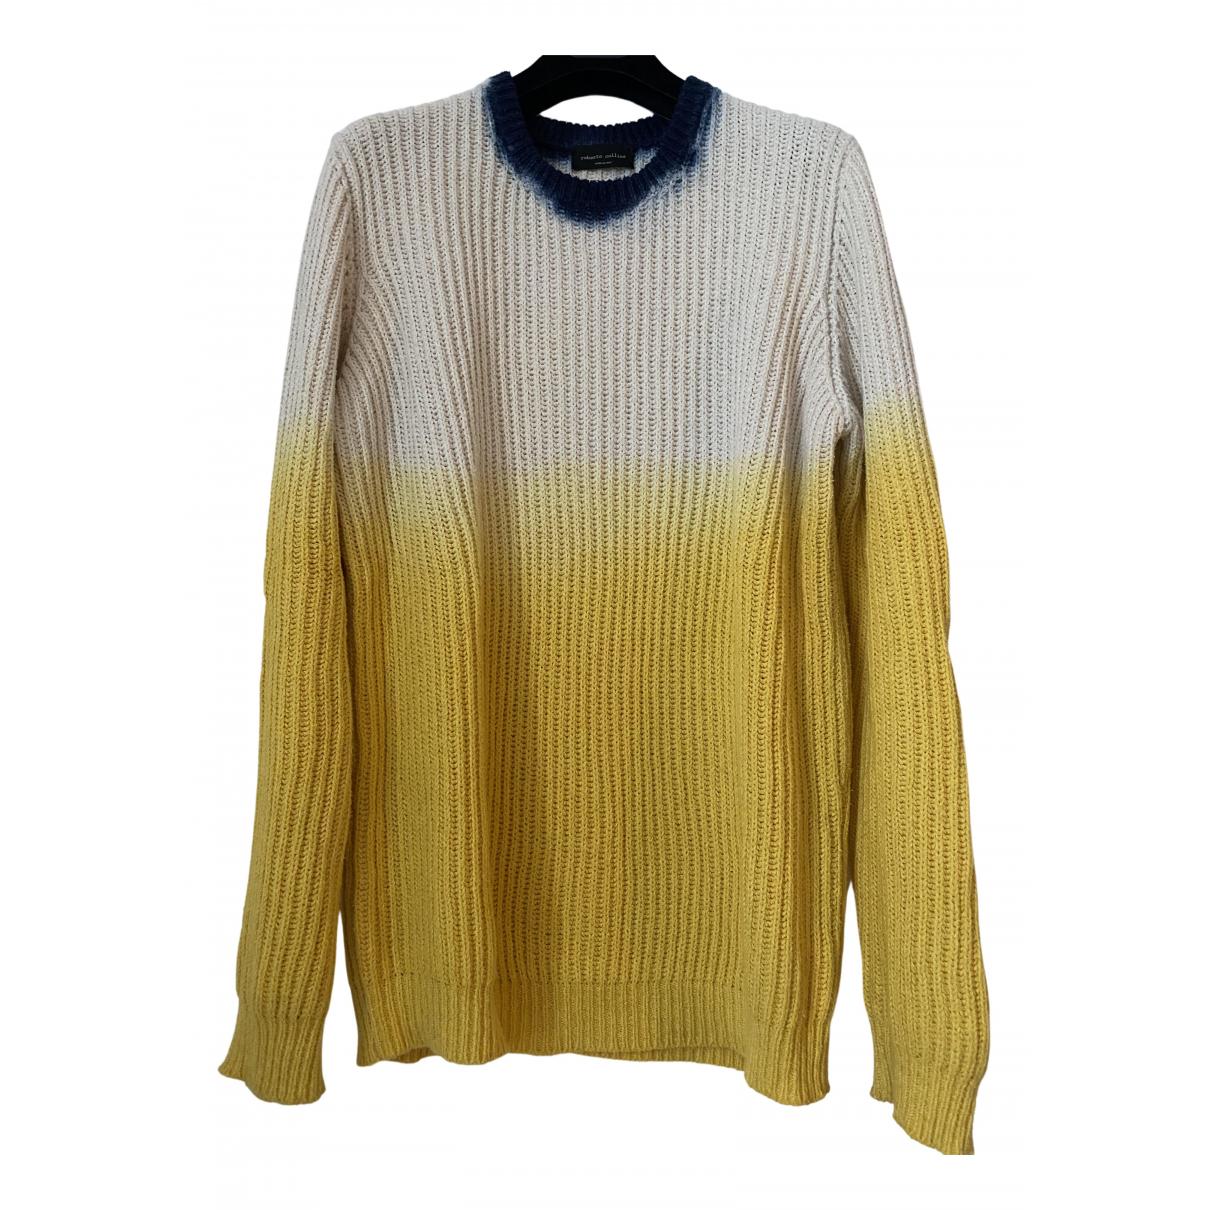 Roberto Collina N Multicolour Cotton Knitwear & Sweatshirts for Men 48 IT